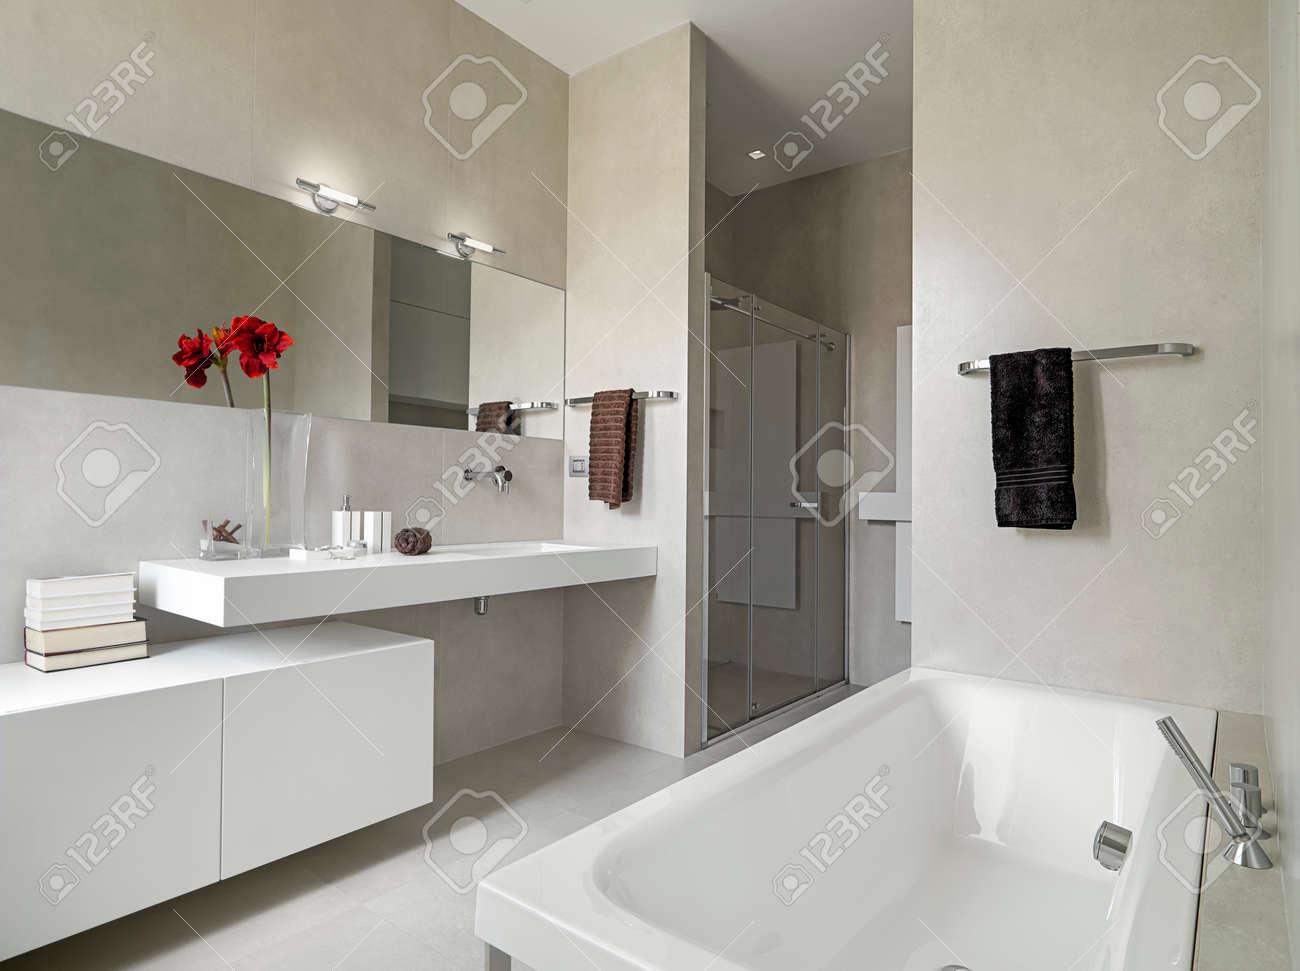 panoramic view of a modern bathroom with washbasin and bathtub Standard-Bild - 32686598